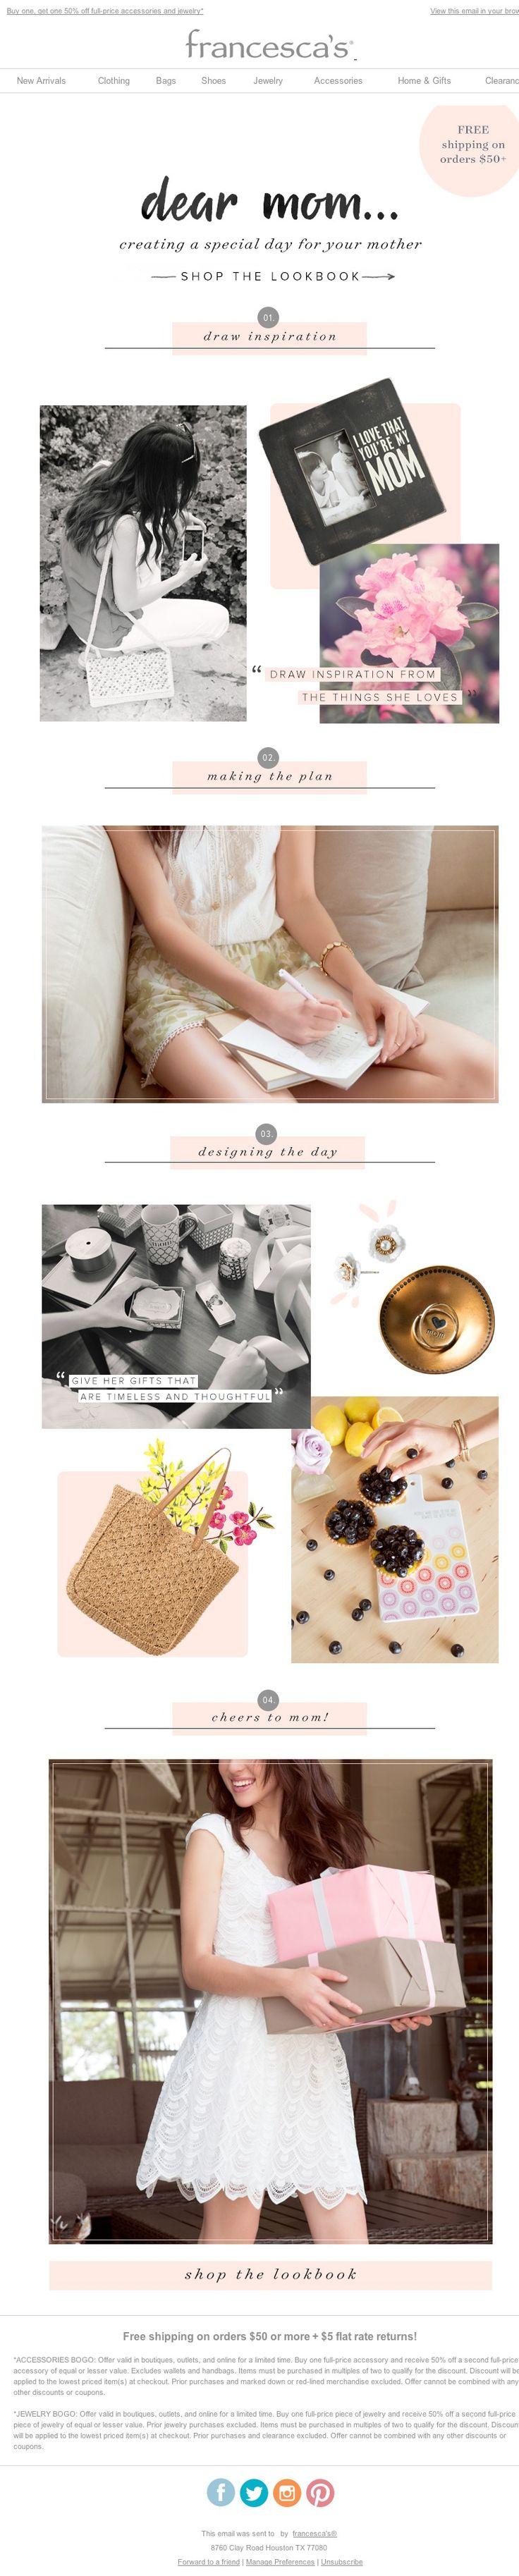 Francesca's - Shop Our Mother's Day Lookbook